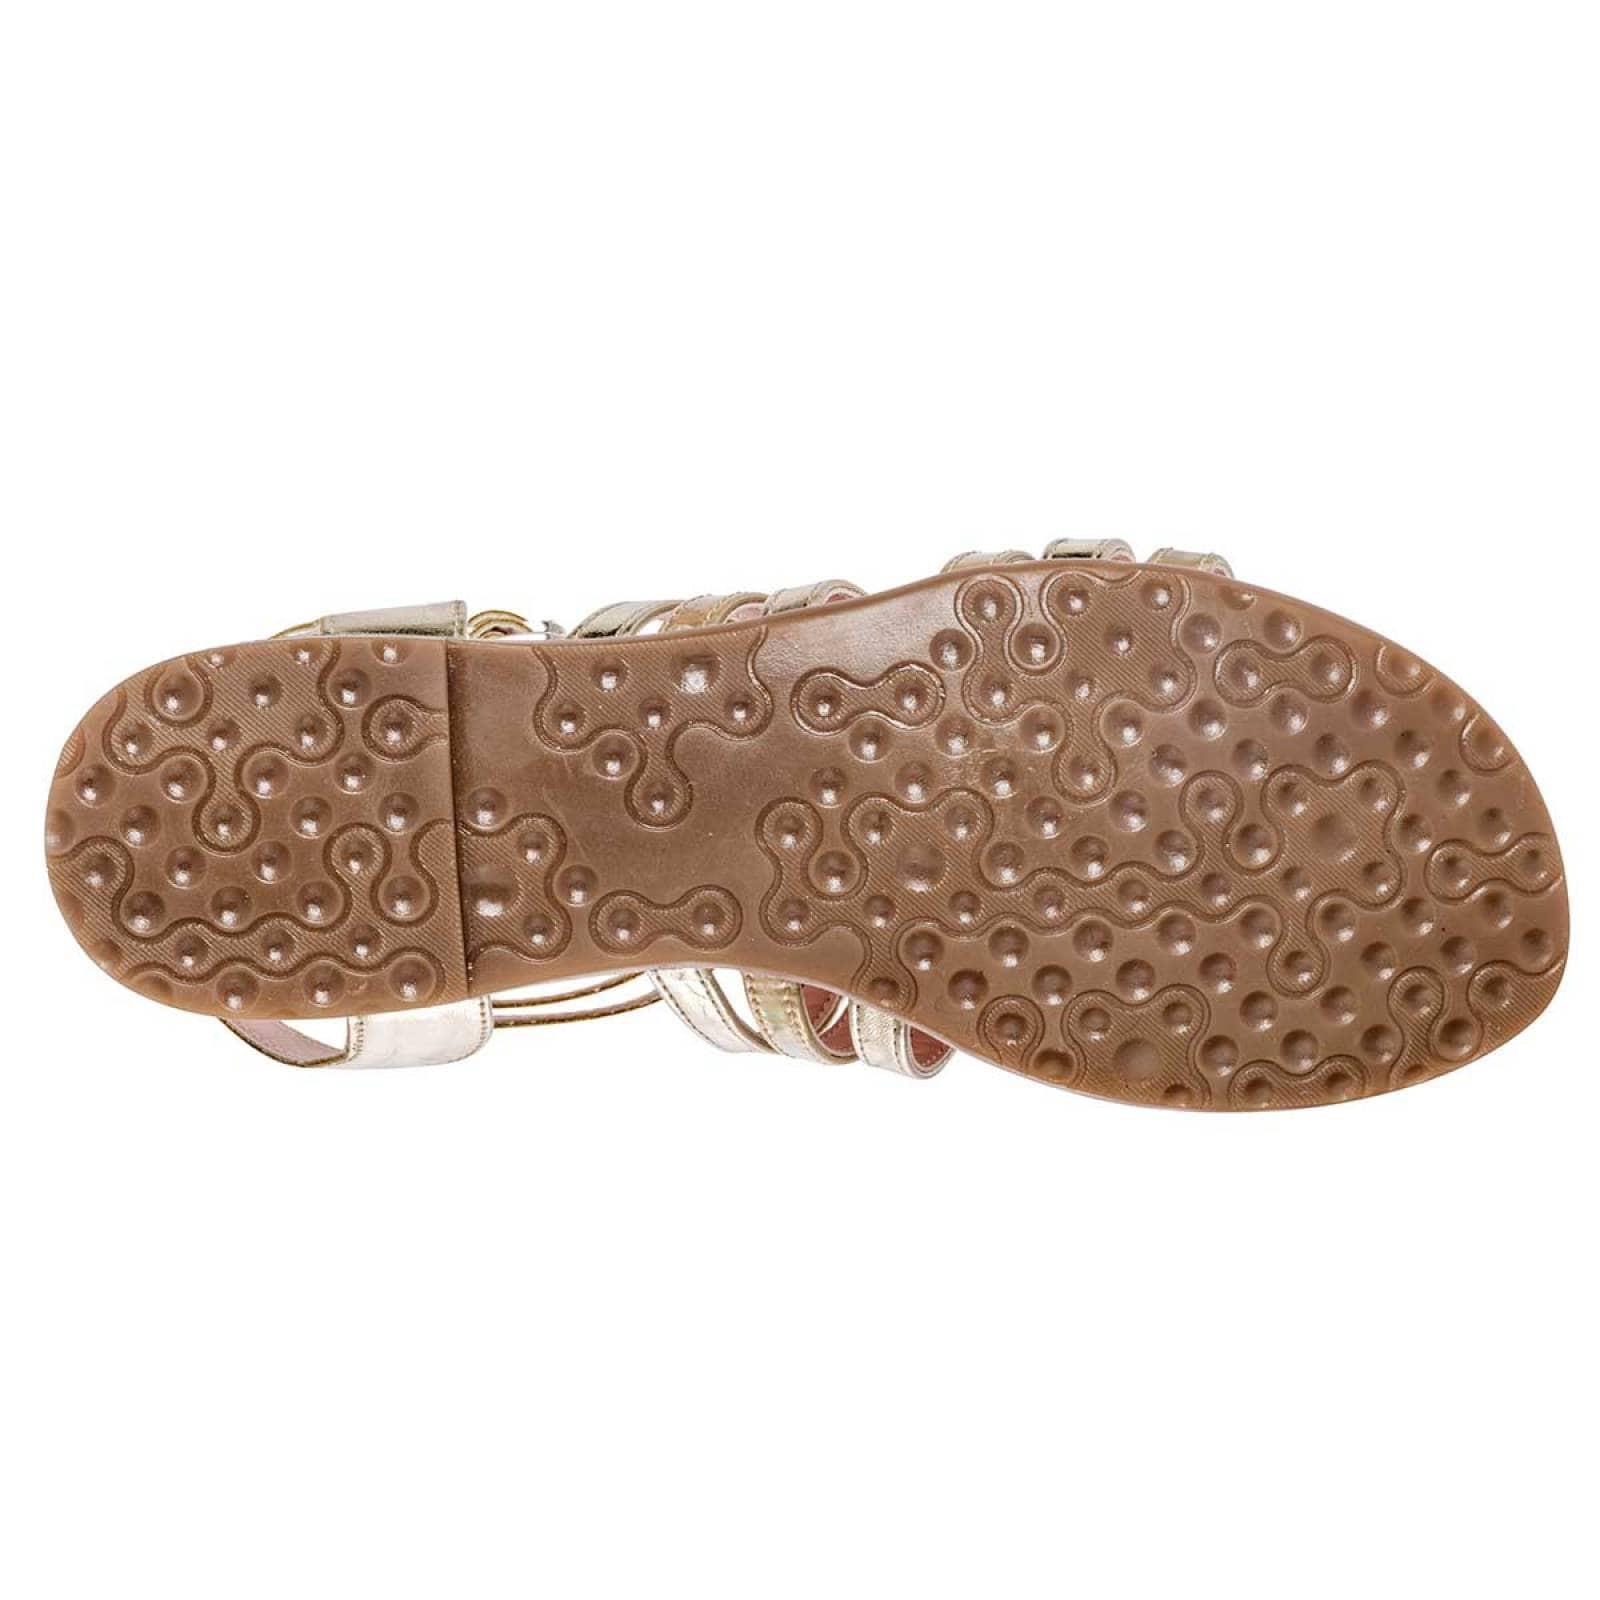 Jeans shoes Sandalia Mujer Oro tornasol